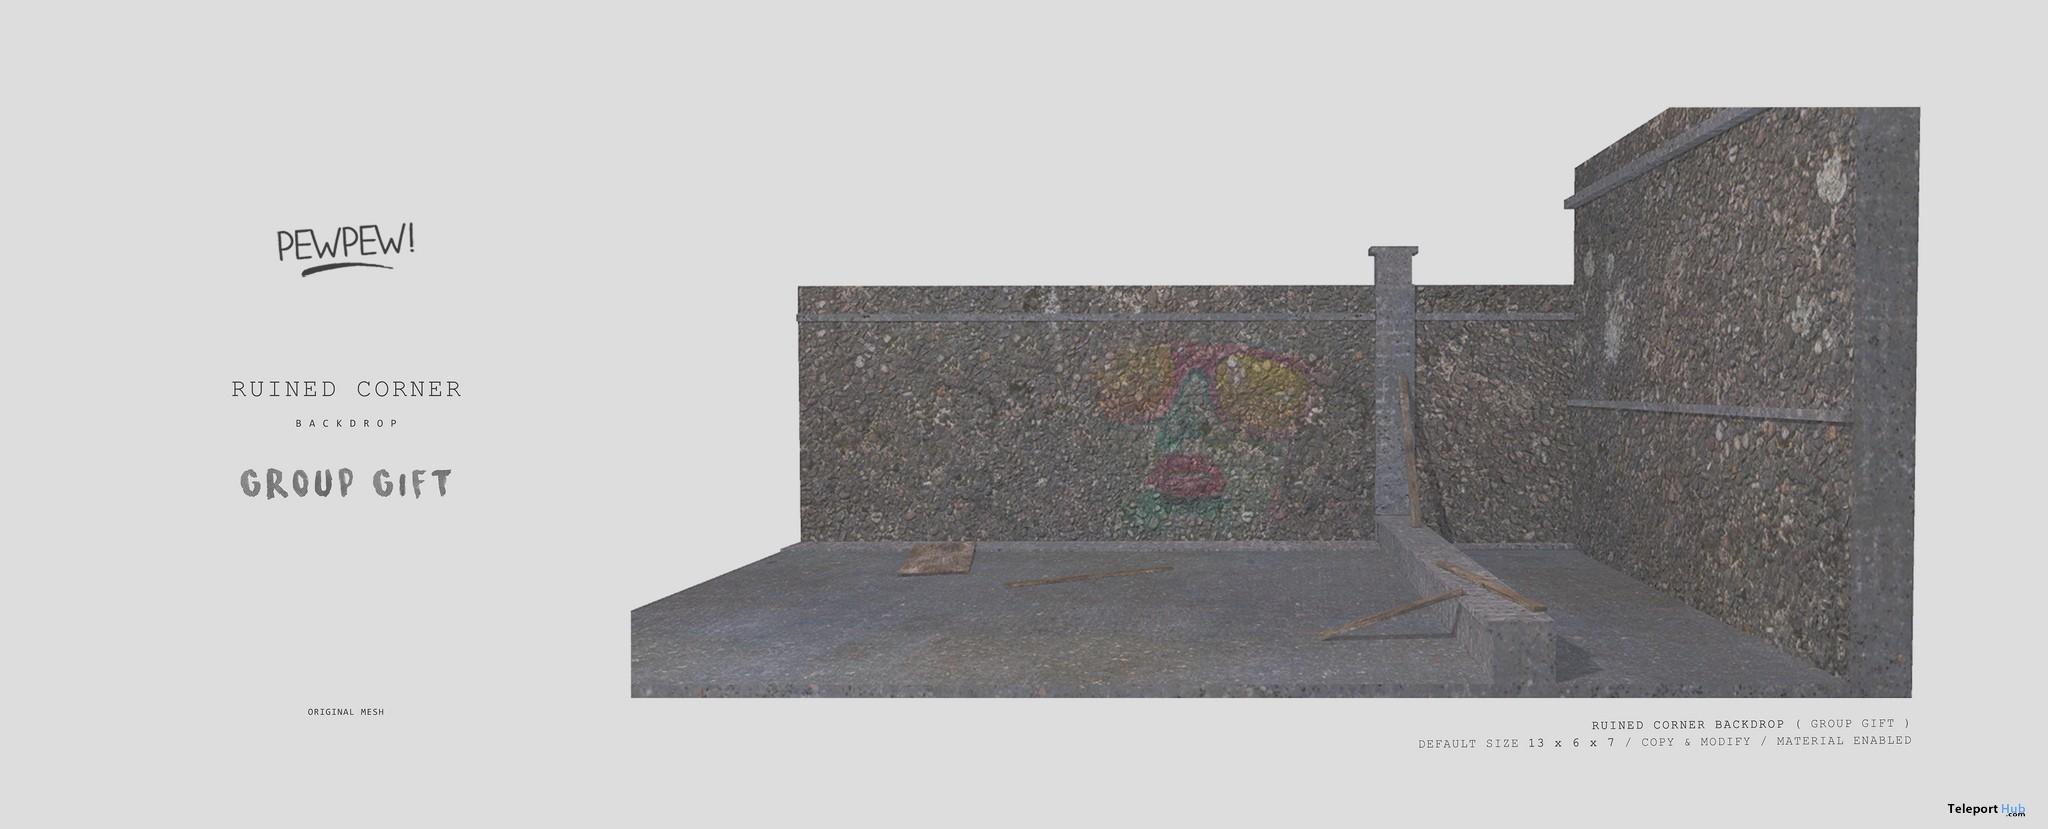 Ruined Corner Backdrop Group Gift by Pewpew! - Teleport Hub - teleporthub.com